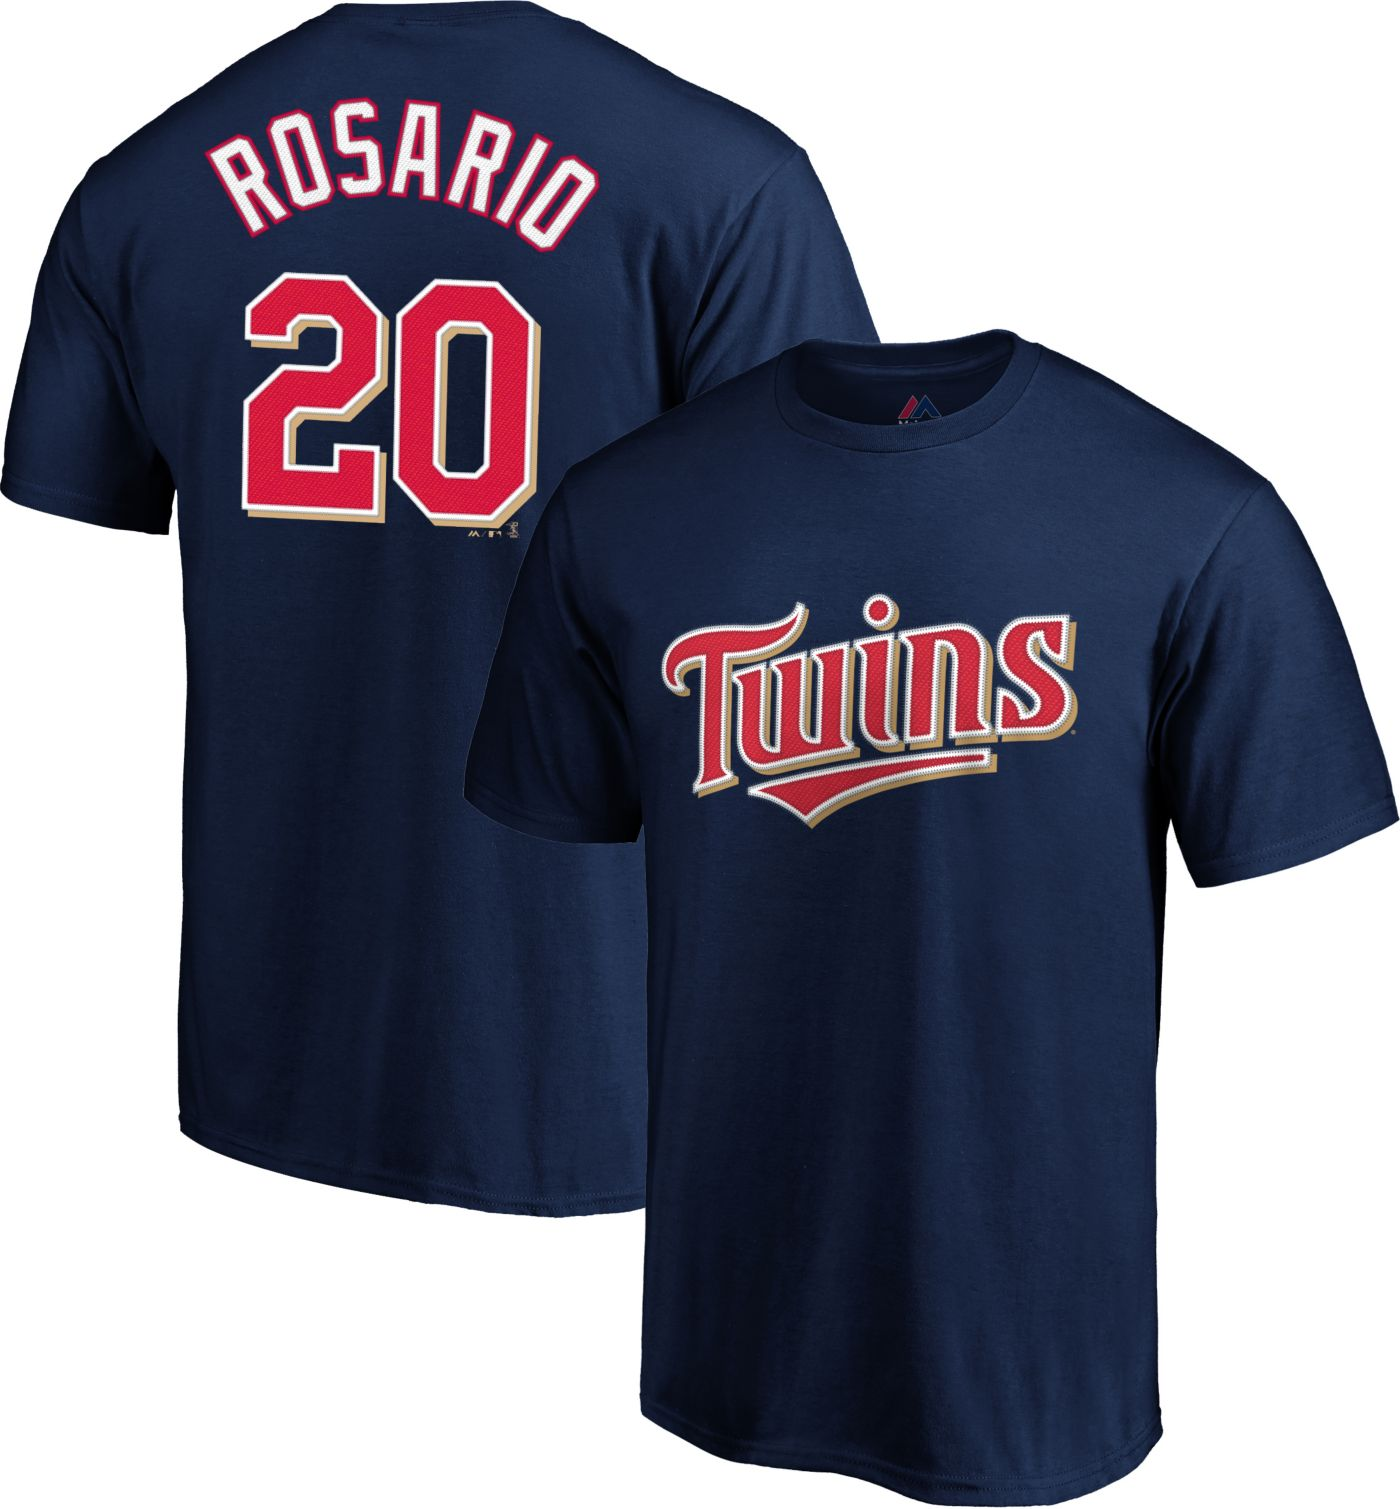 Majestic Youth Minnesota Twins Eddie Rosario #20 Navy T-Shirt